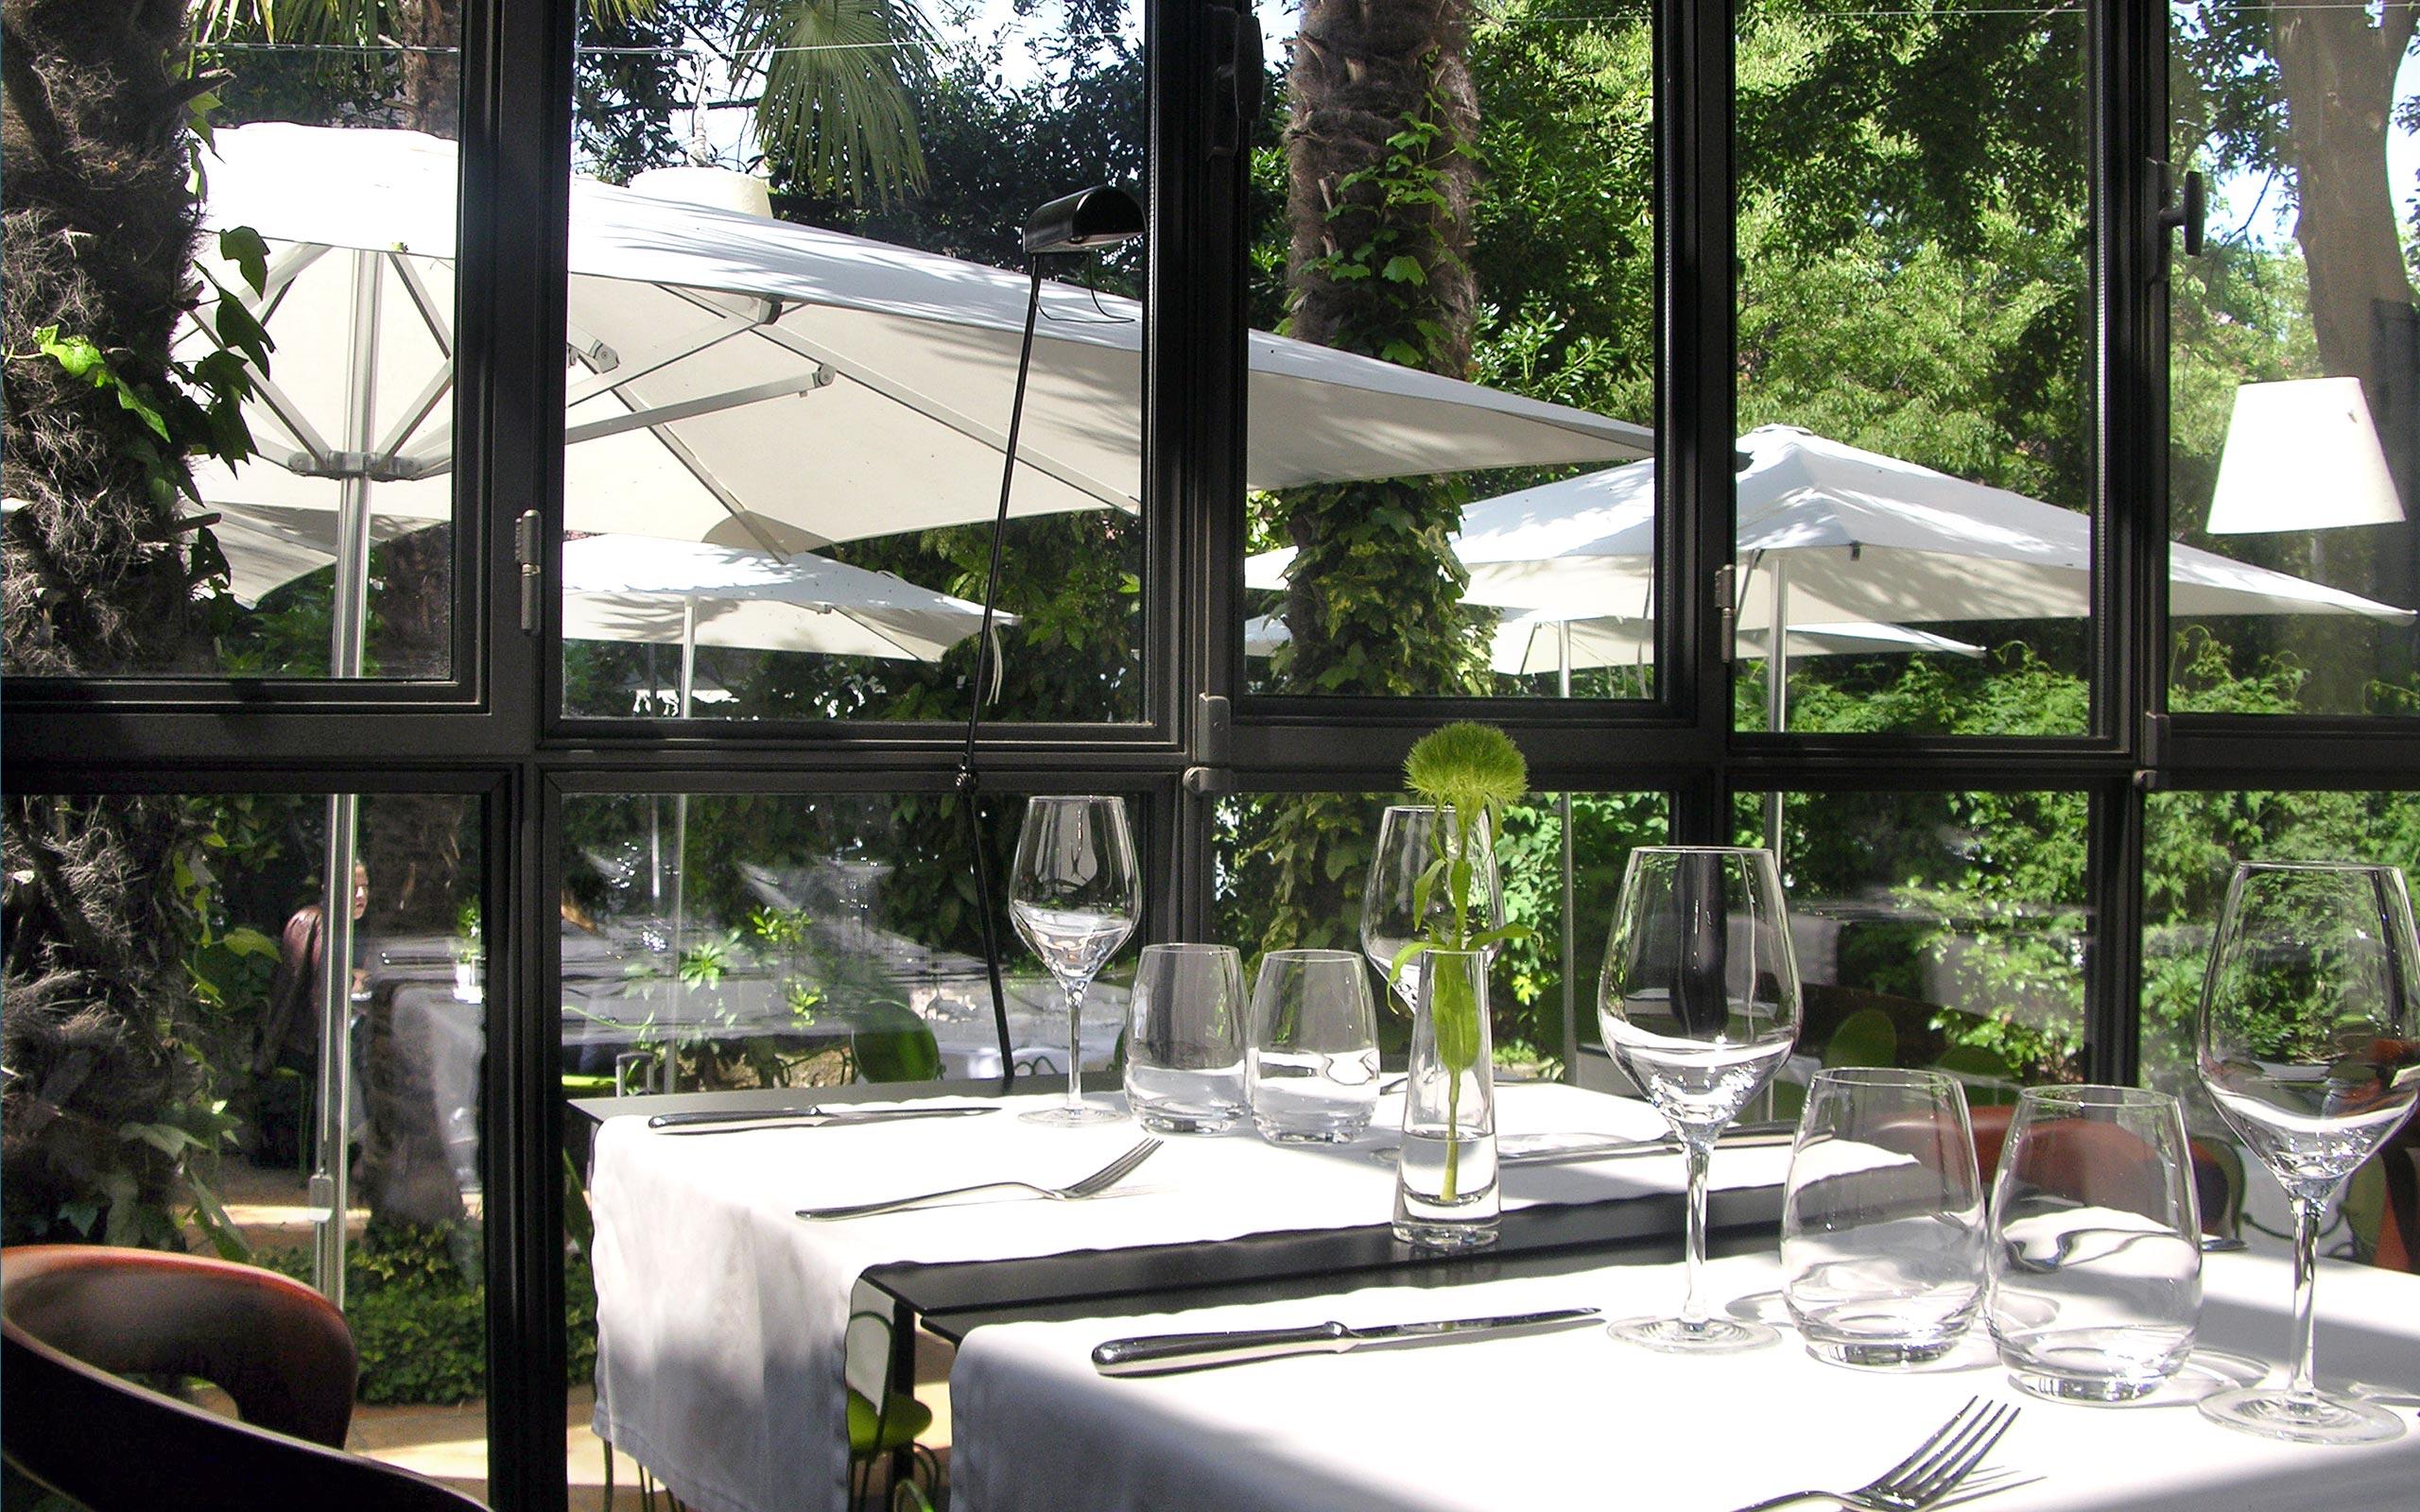 Petit jardin restaurant vitry sur seine maison design - Mobilier jardin yvelines vitry sur seine ...